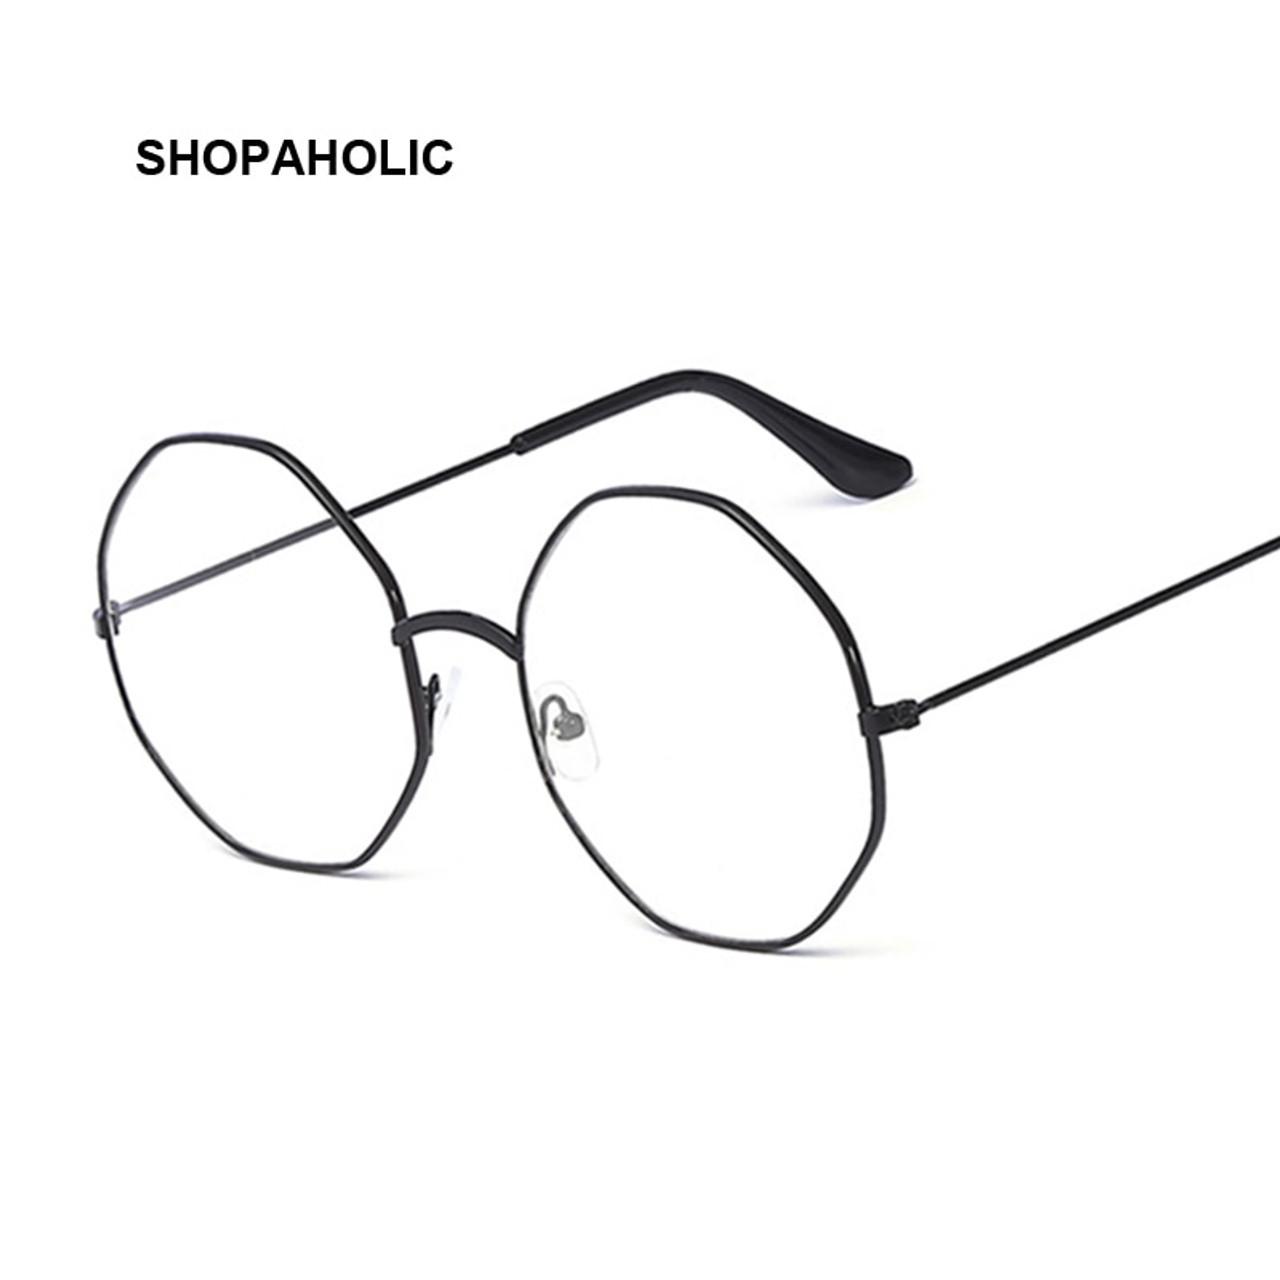 73d8de80bcc5 Glasses Round Spectacle Glasses Frame Sunglasses Men Women Vintage Metal  Mirror Sun Glasses Female Frames Optical ...